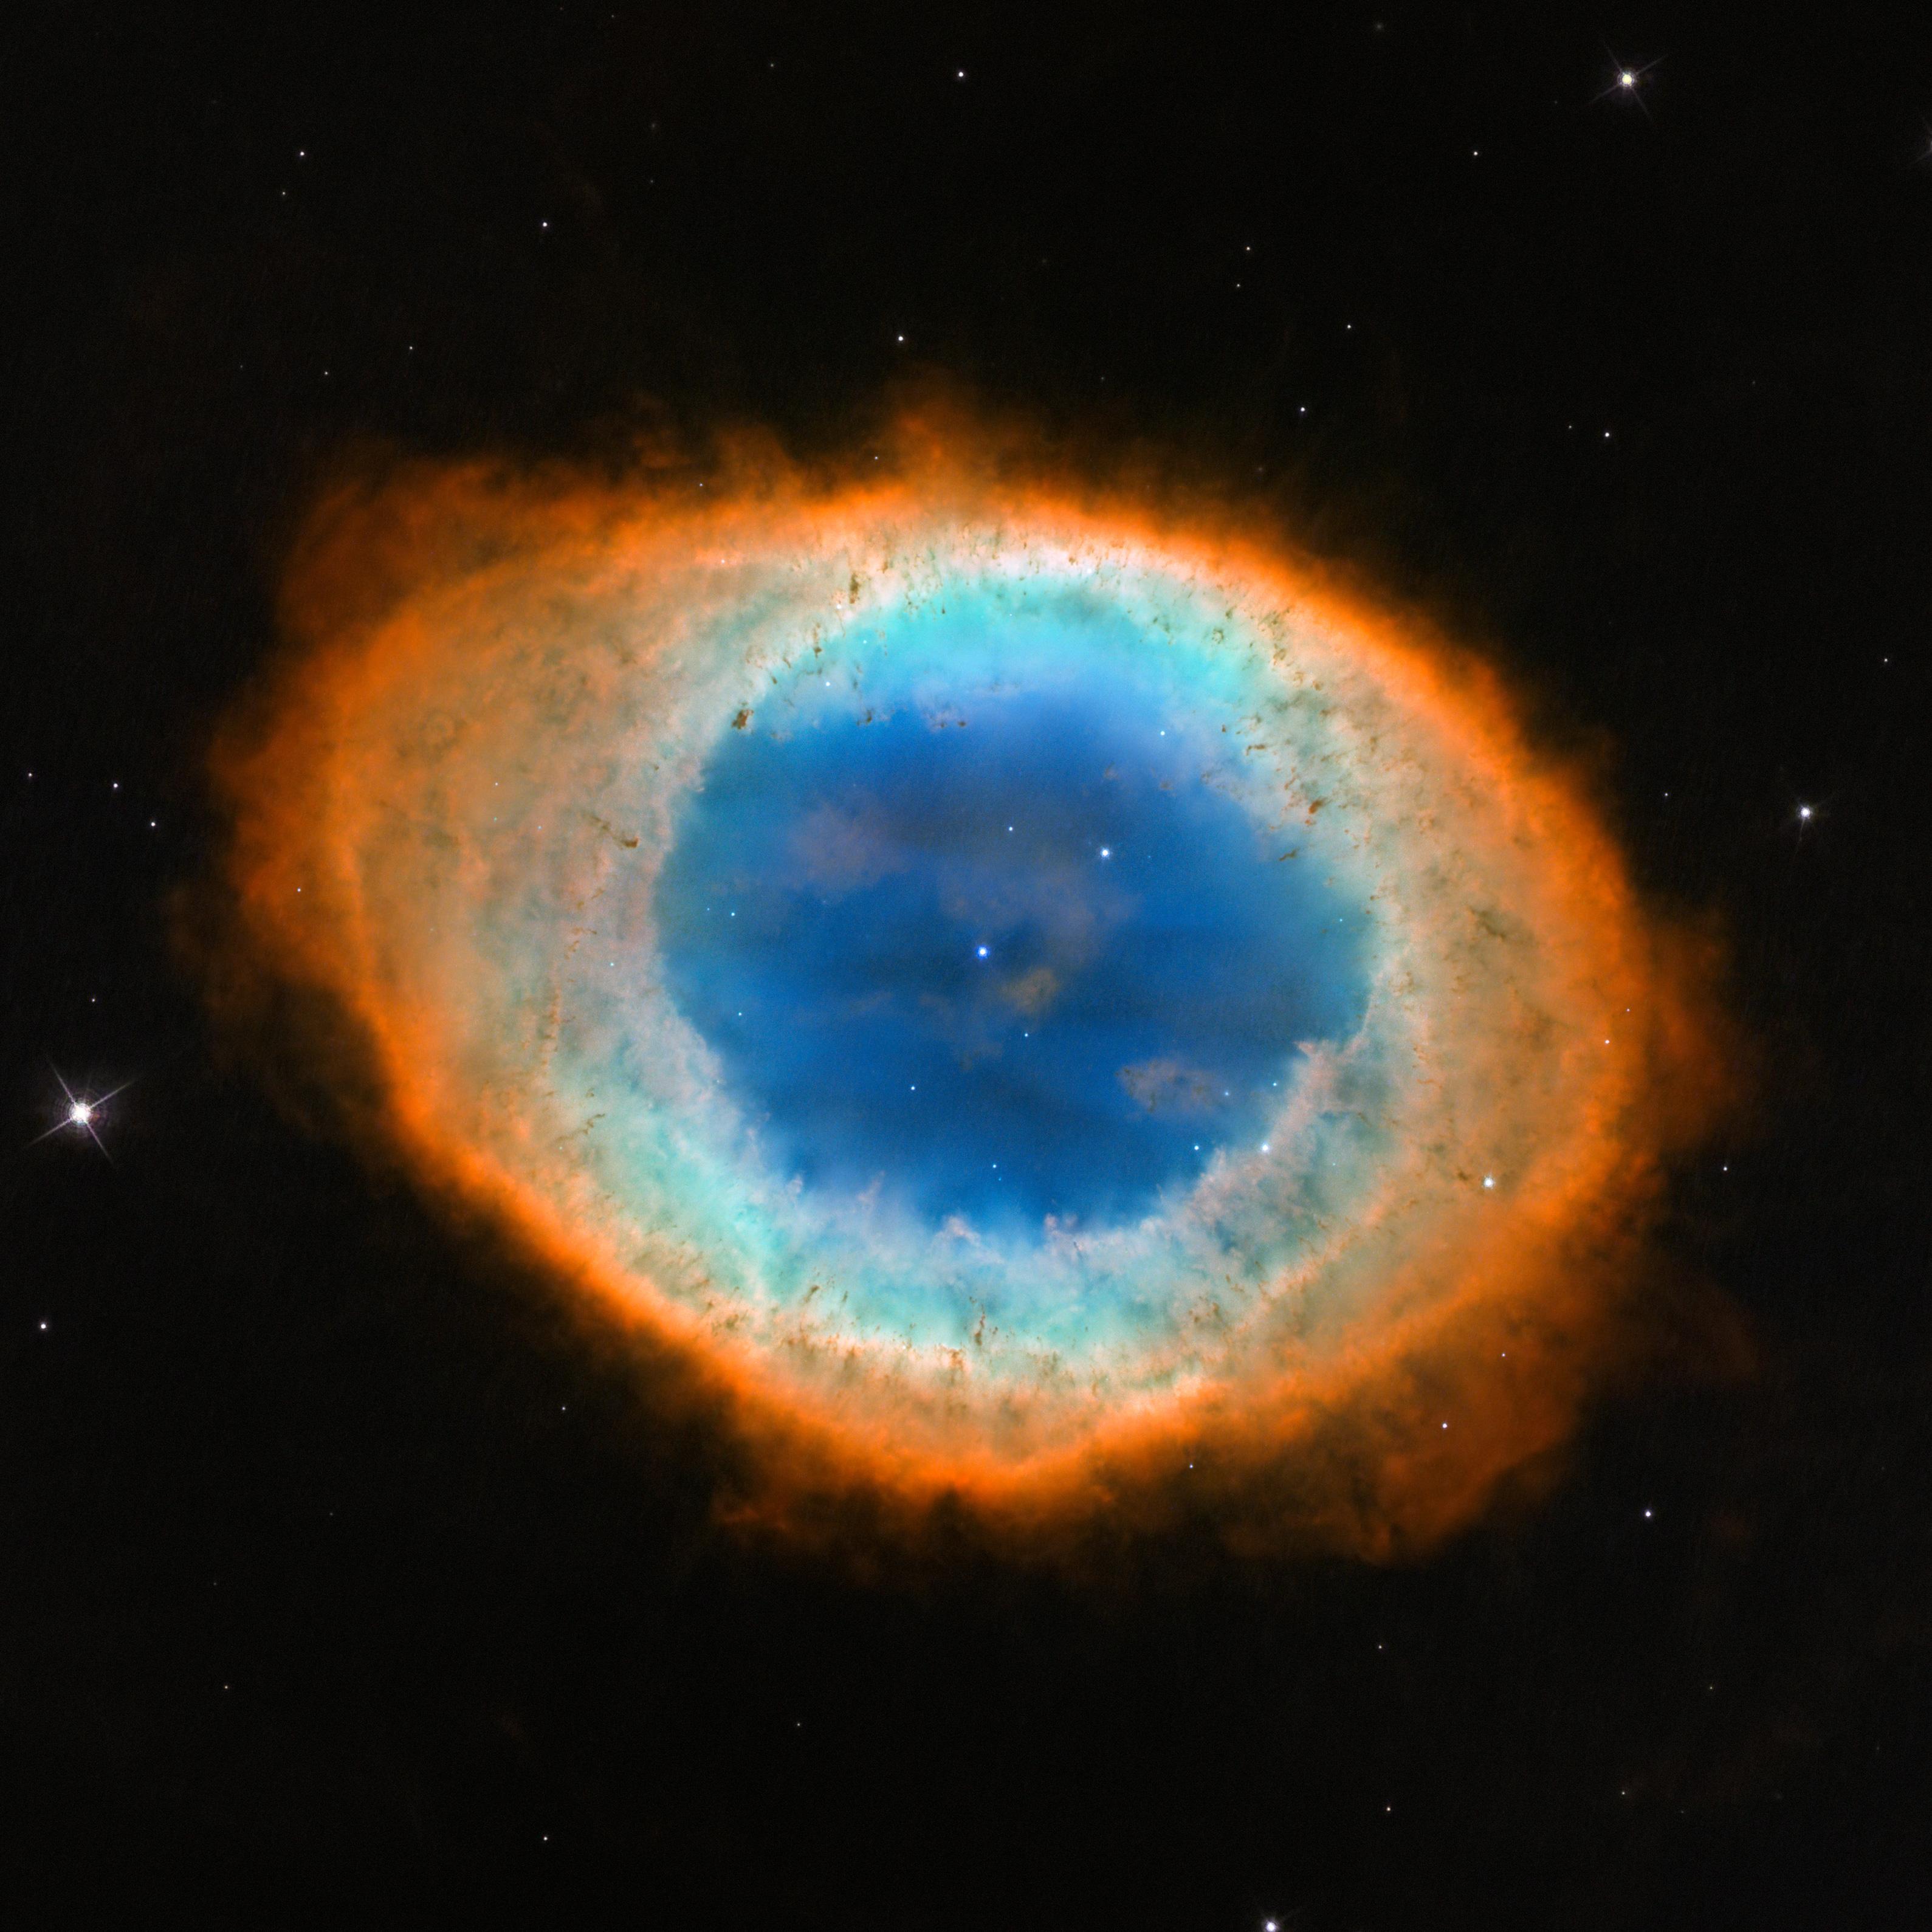 File:Hubble image of the Ring Nebula (Messier 57).jpg